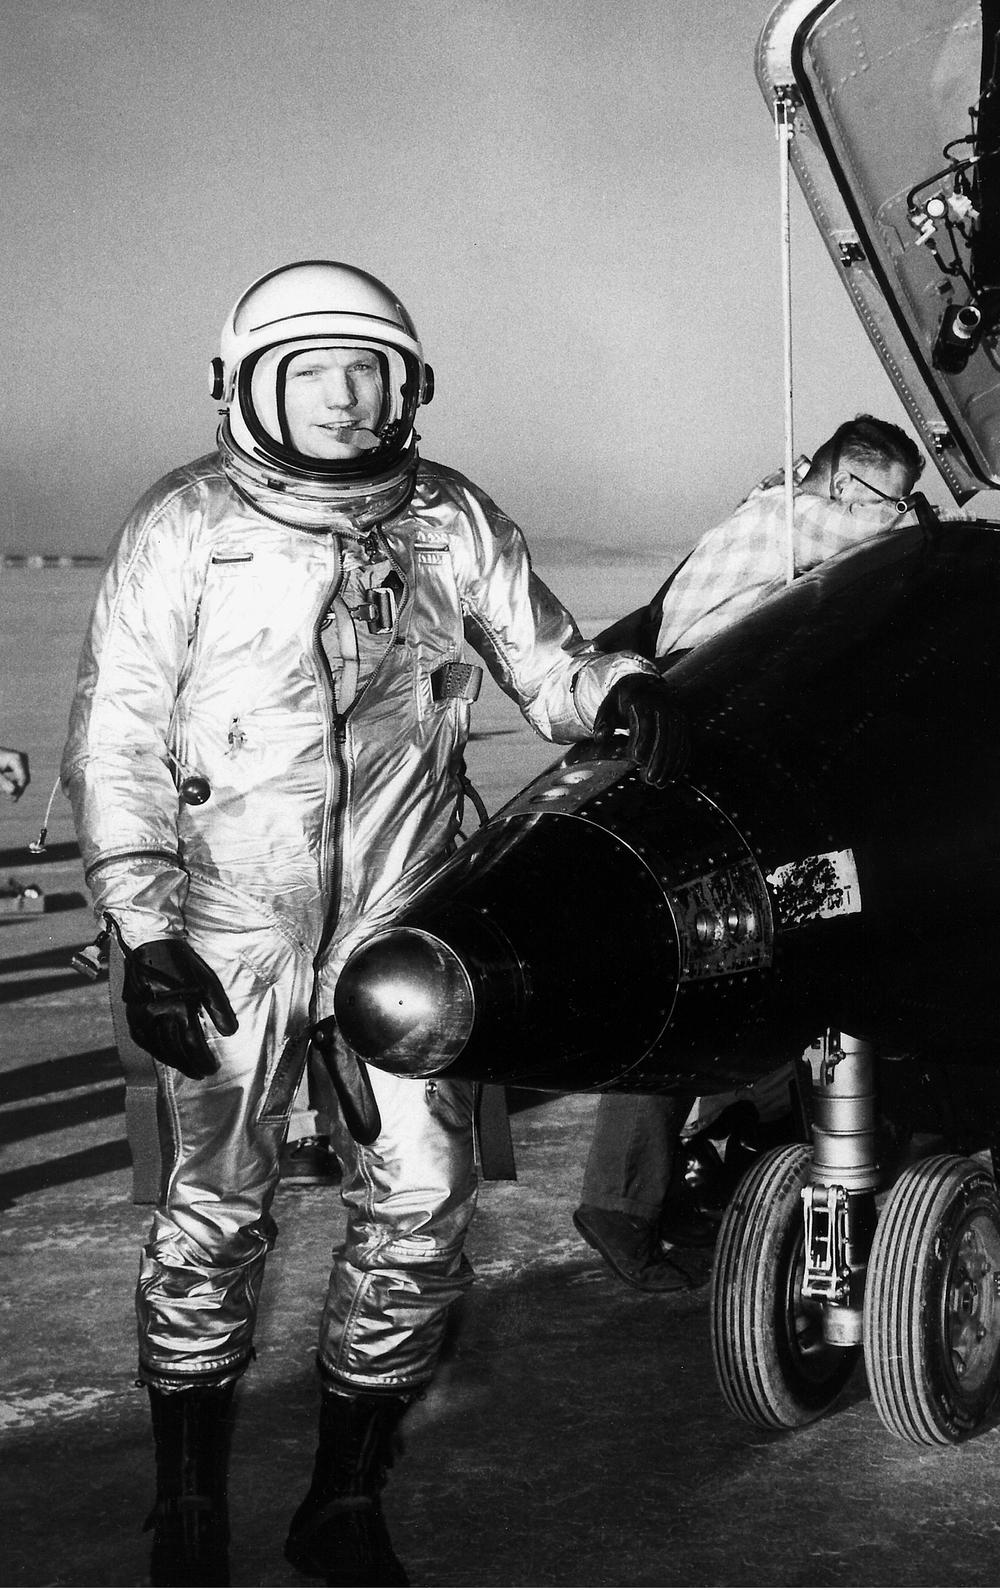 Pilot Neil Armstrong